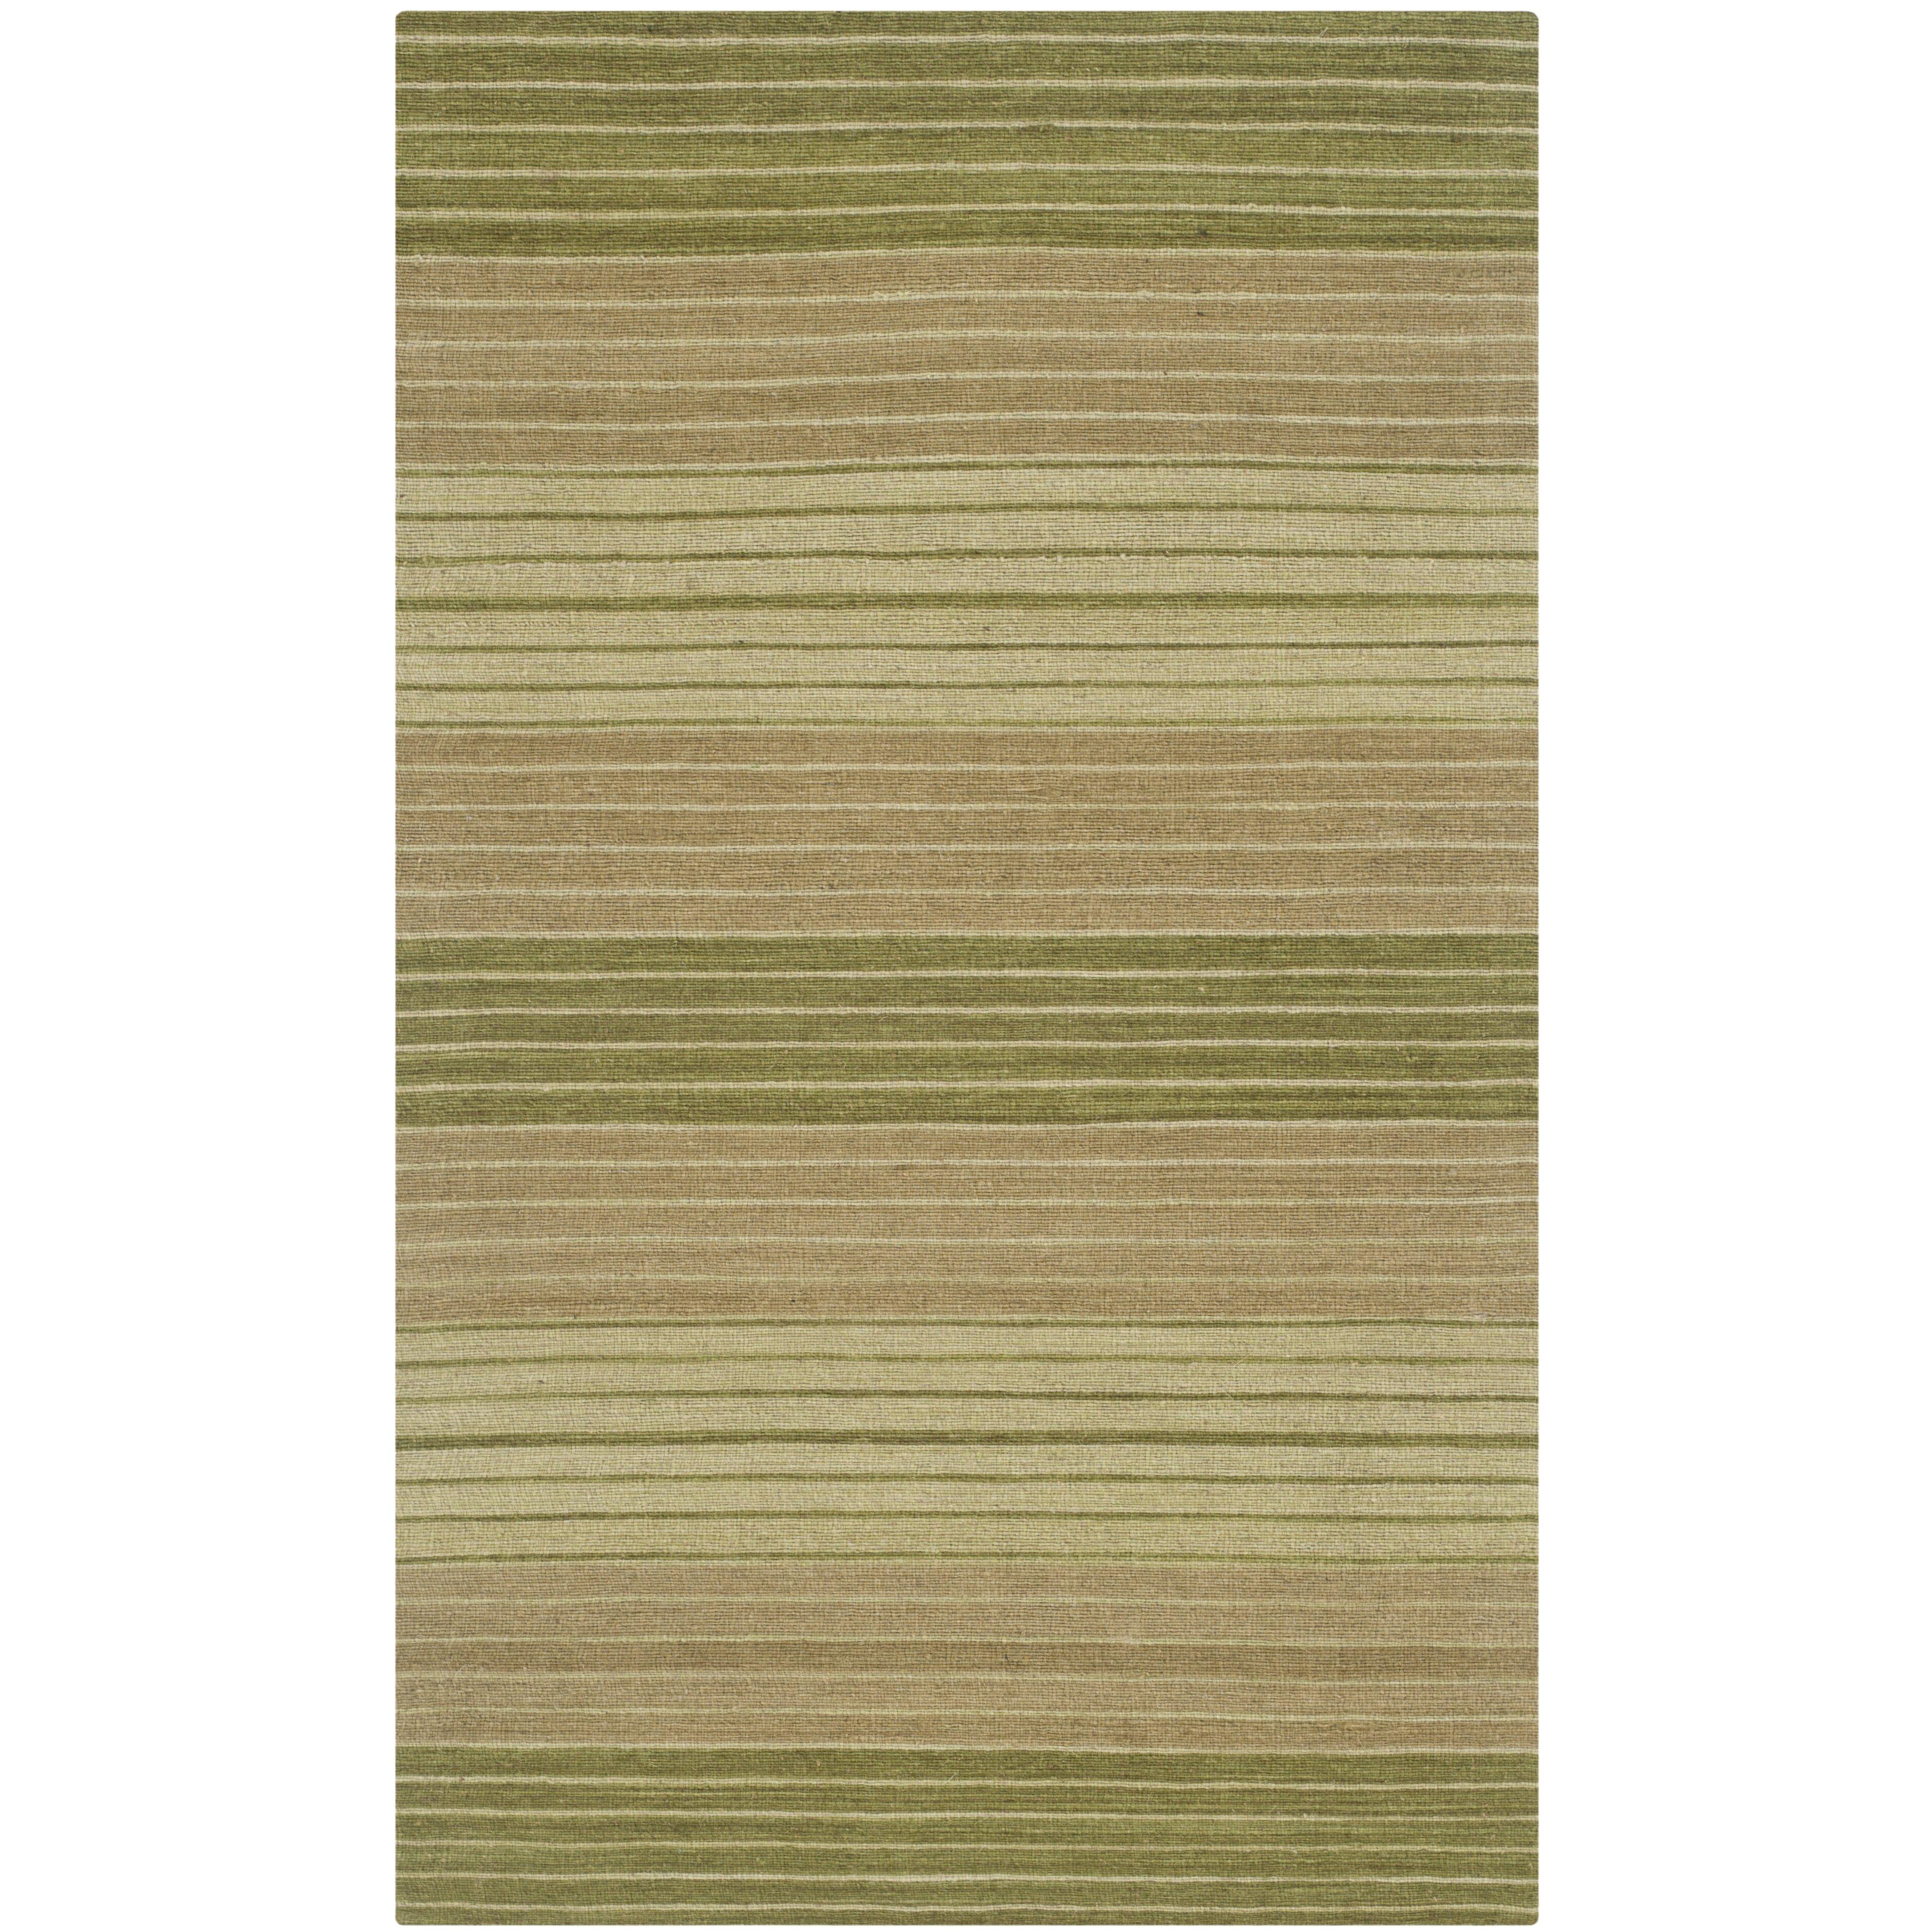 Safavieh Marbella Green Striped Area Rug Amp Reviews Wayfair